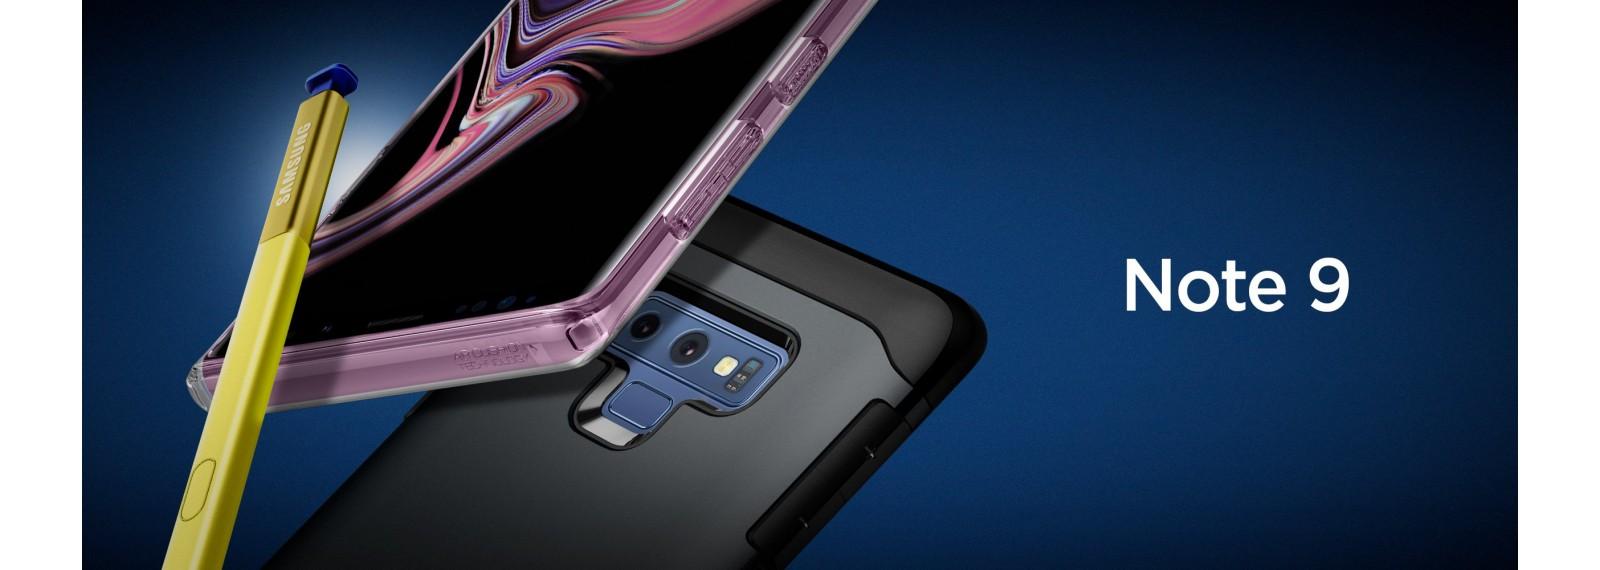 Spigen Malaysia Samsung Galaxy Note 9 Casing